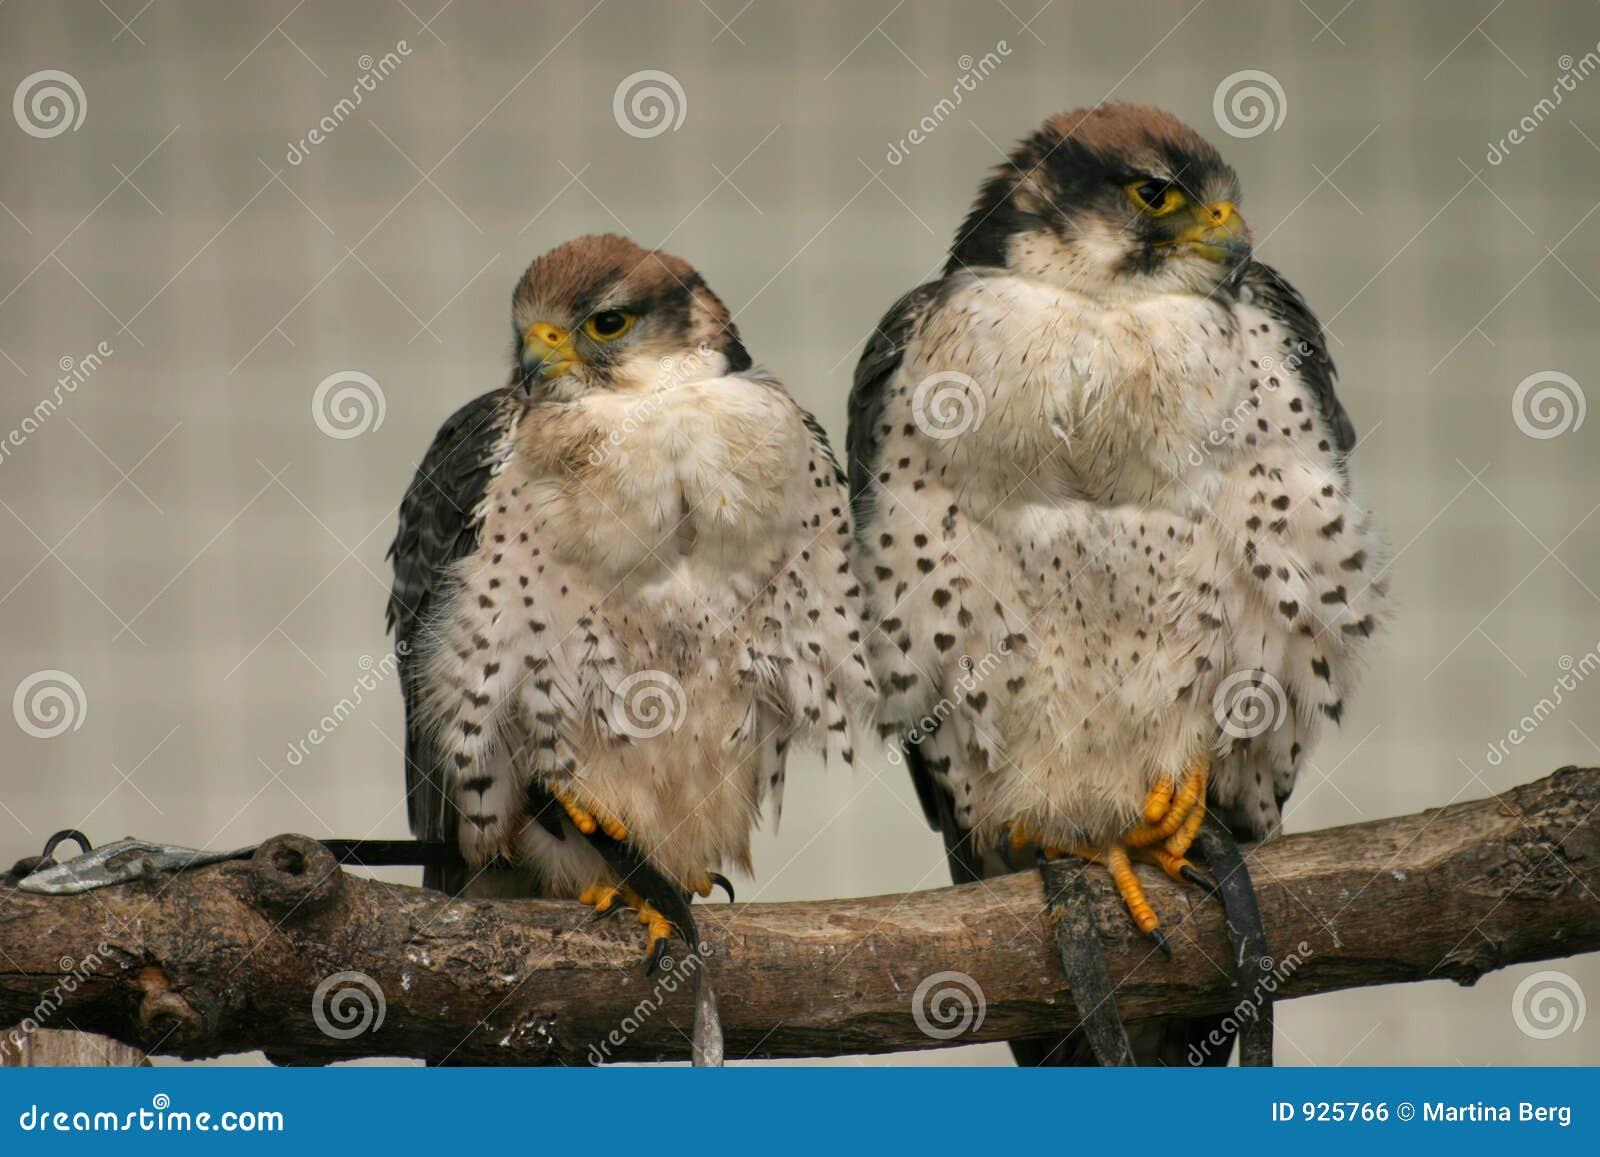 Lanner falcons